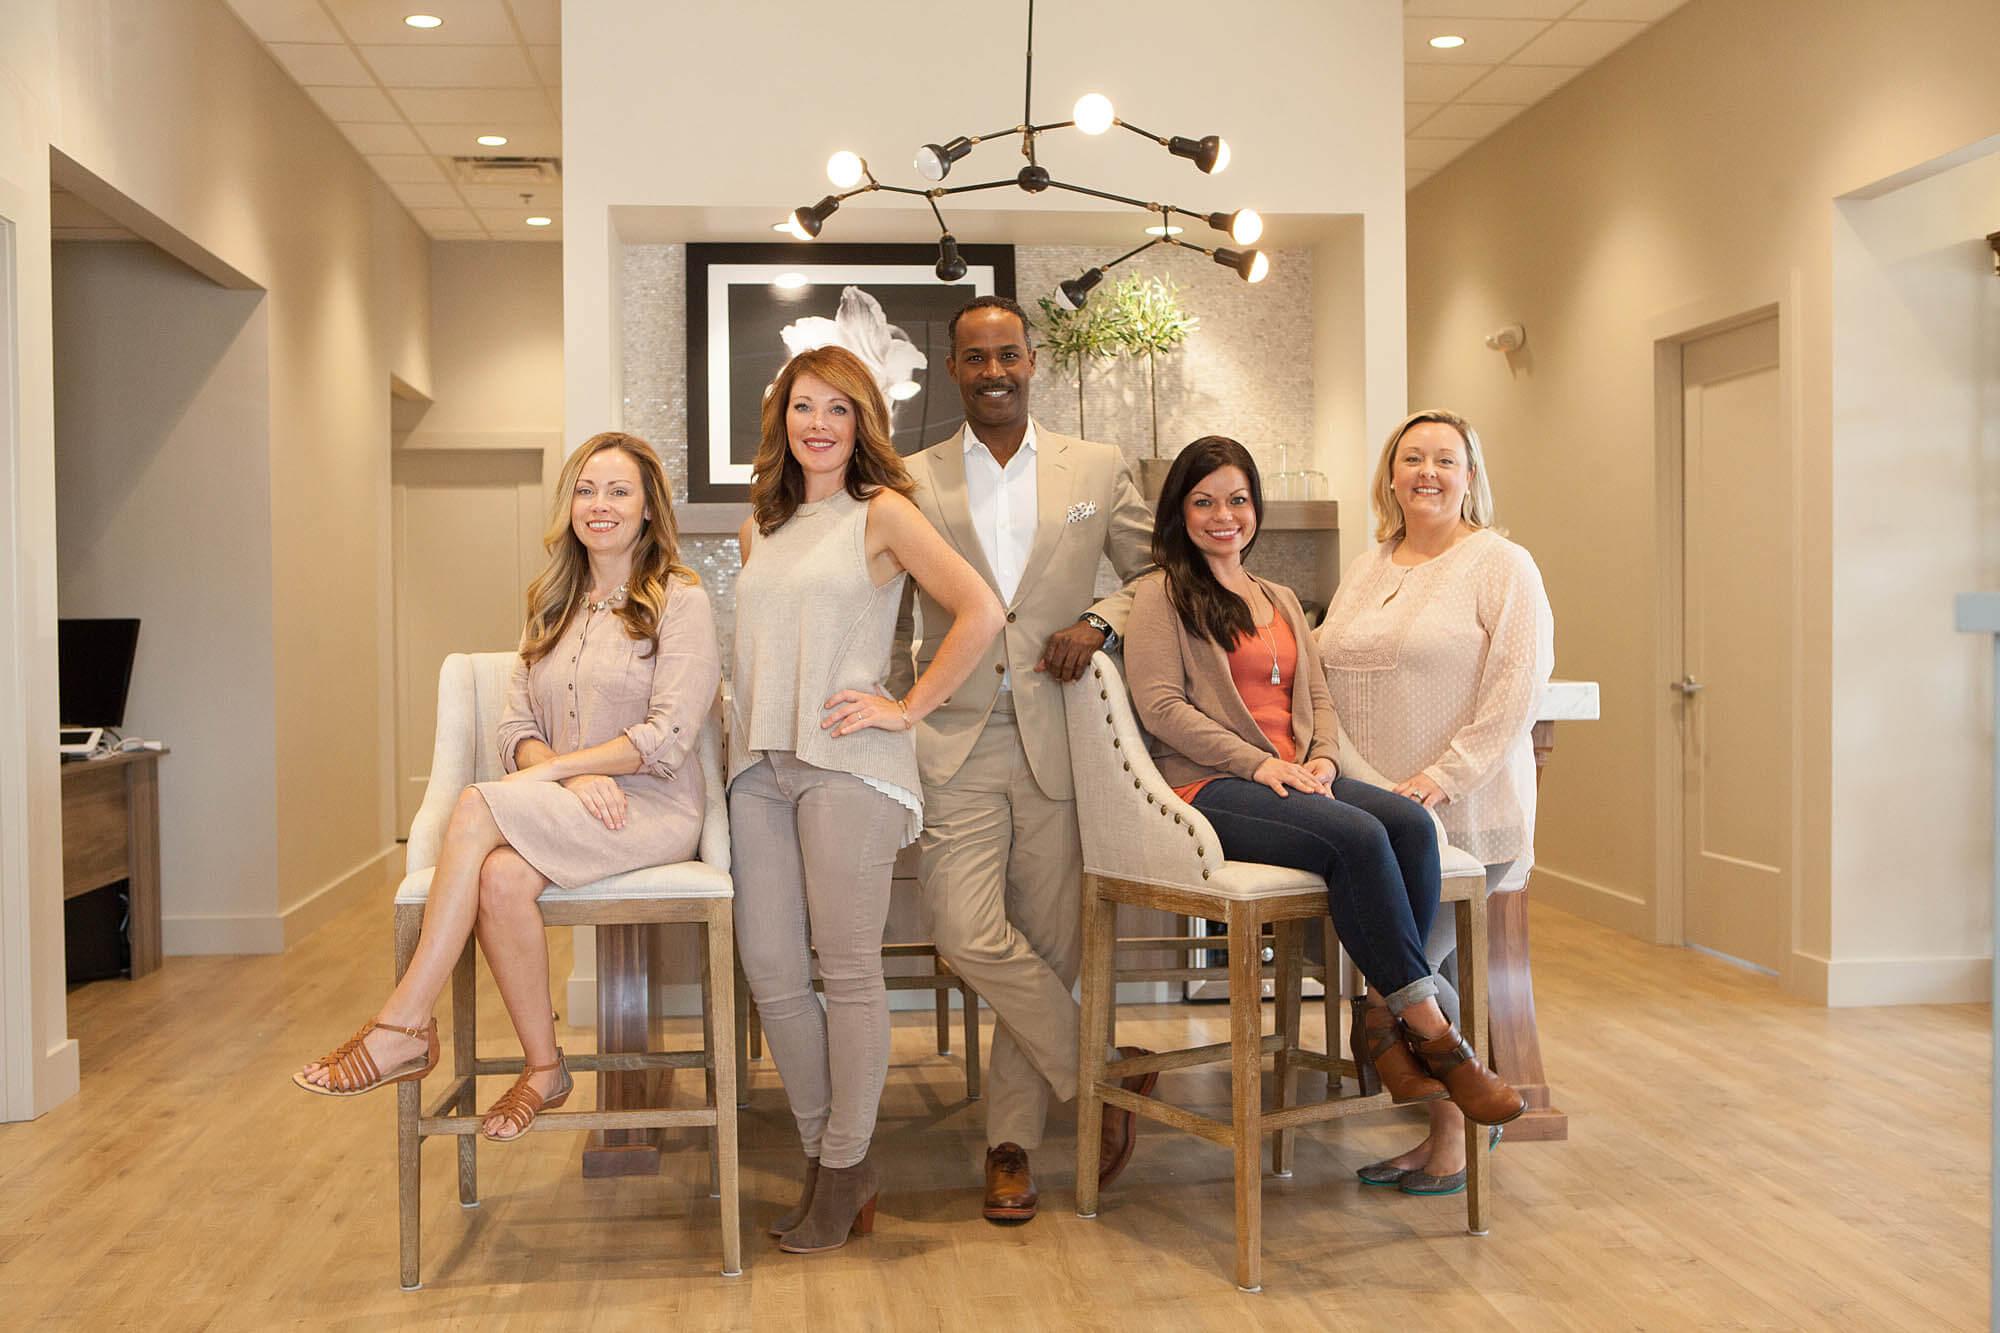 Meet the Team at The Look Facial Aesthetics